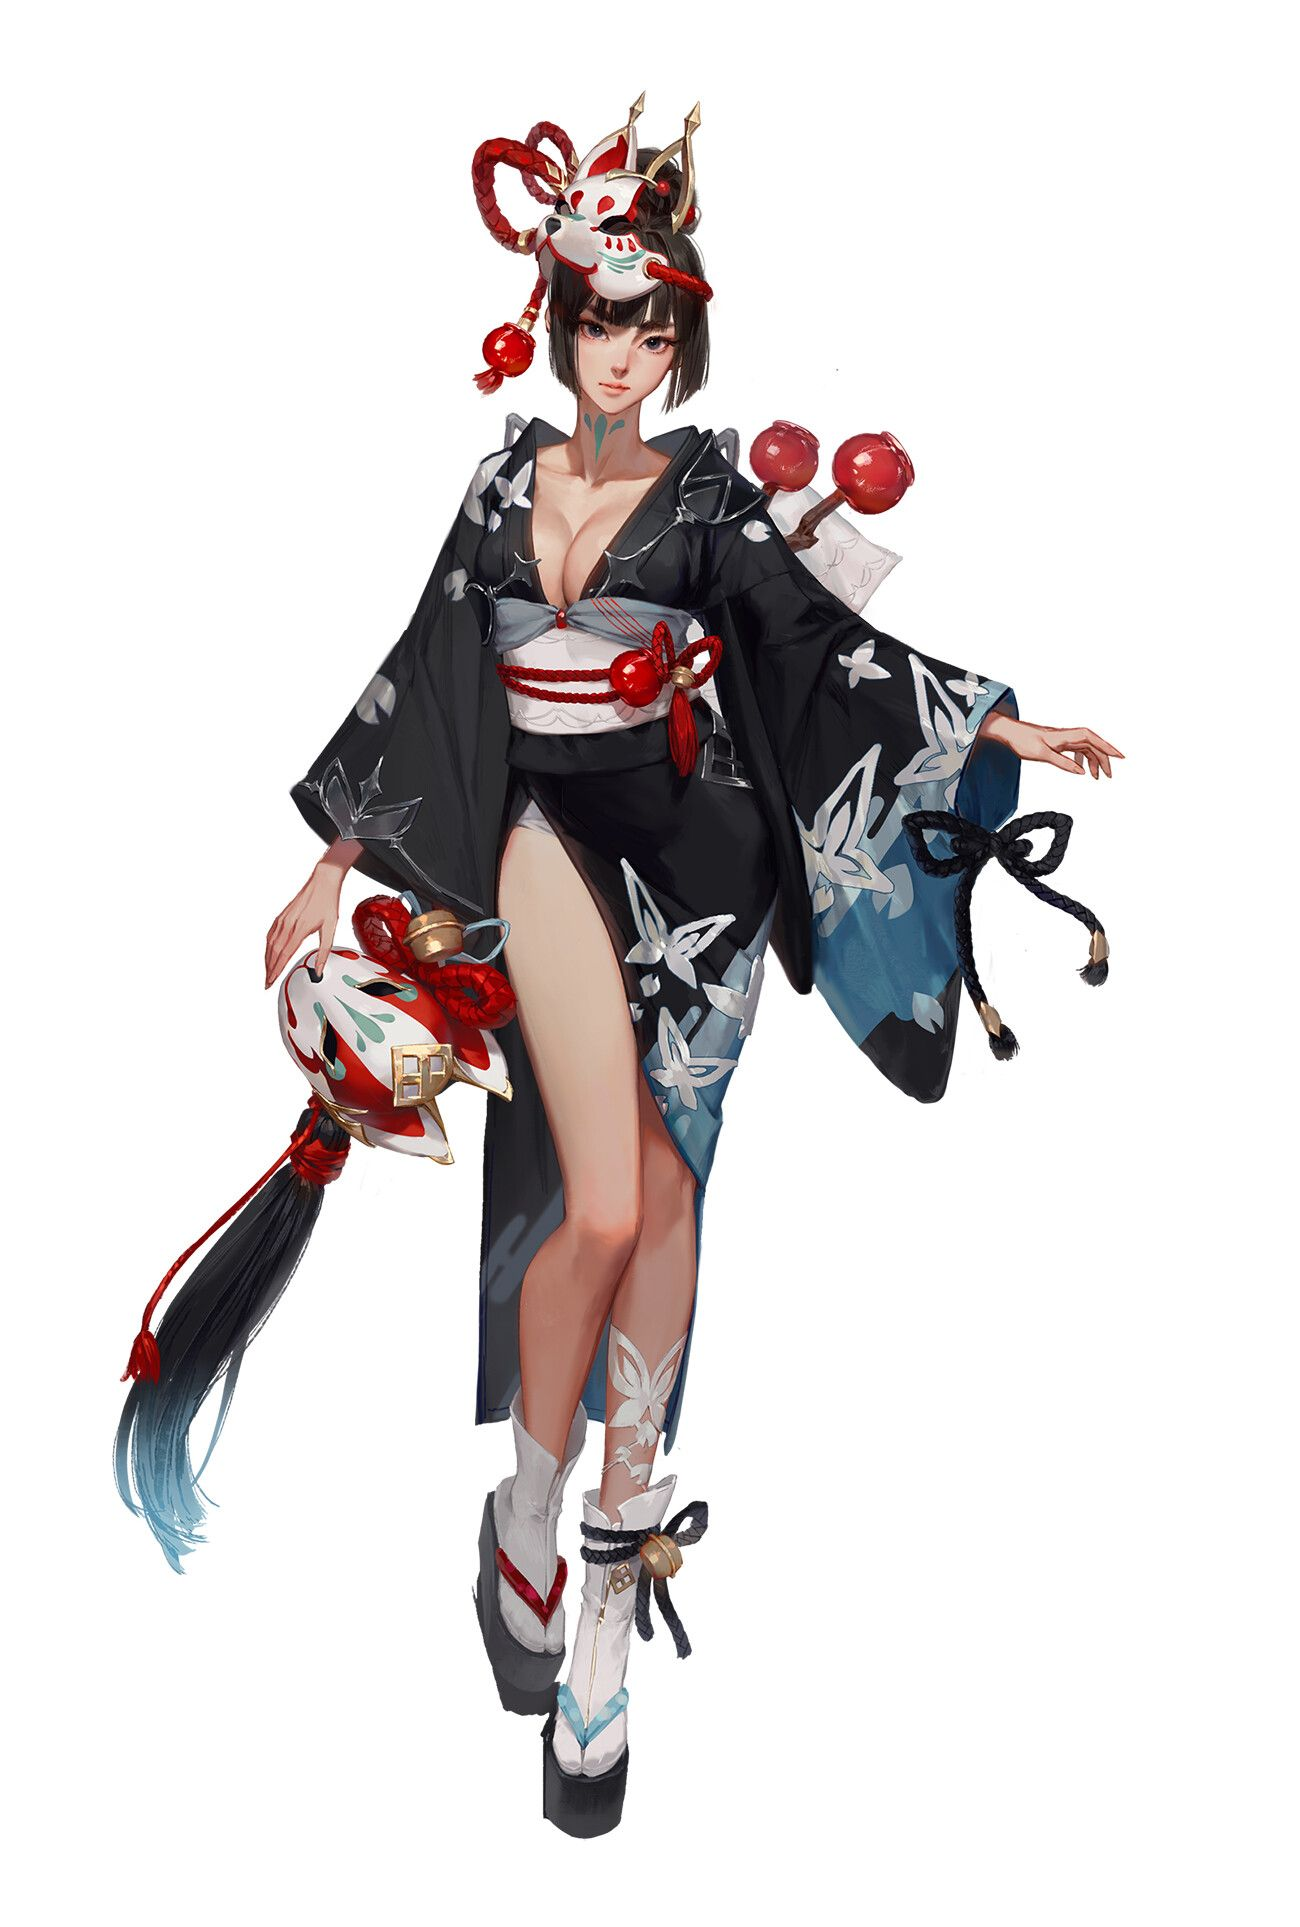 Artstation talion japan costume_assassin largo art in